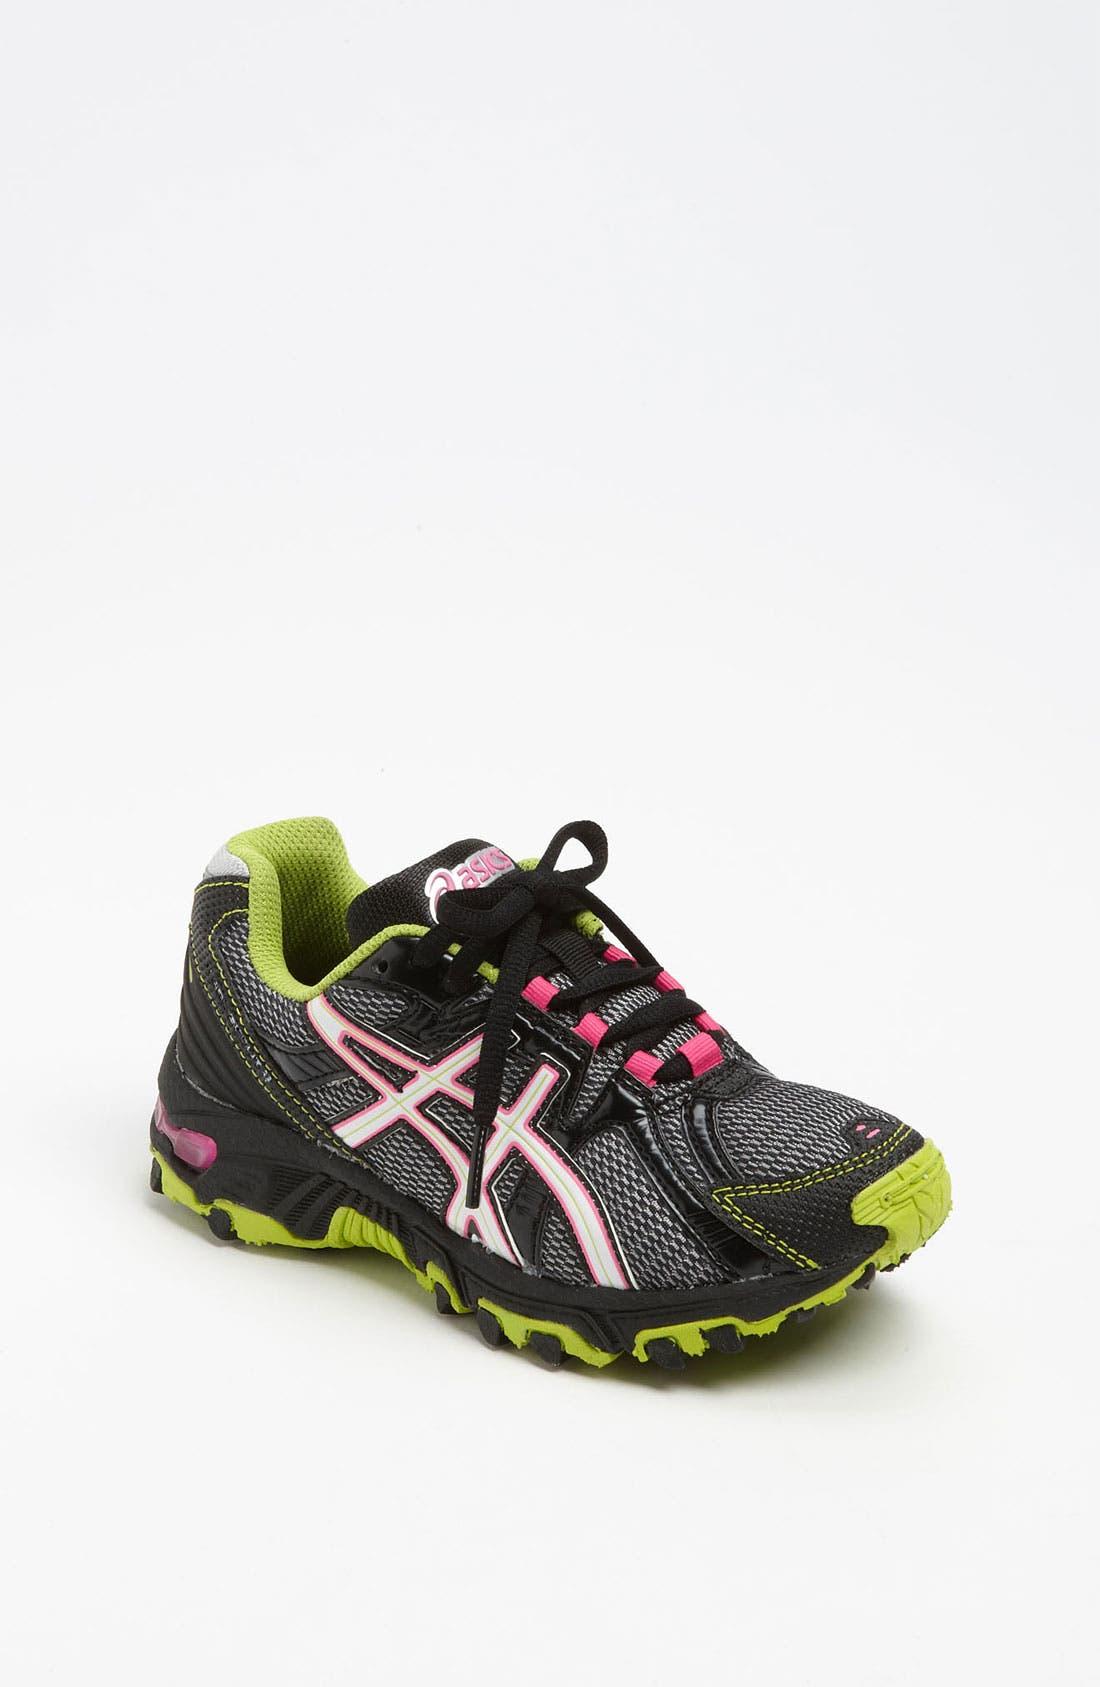 Alternate Image 1 Selected - ASICS® 'GEL-Scout' Running Shoe (Little Kid & Big Kid)